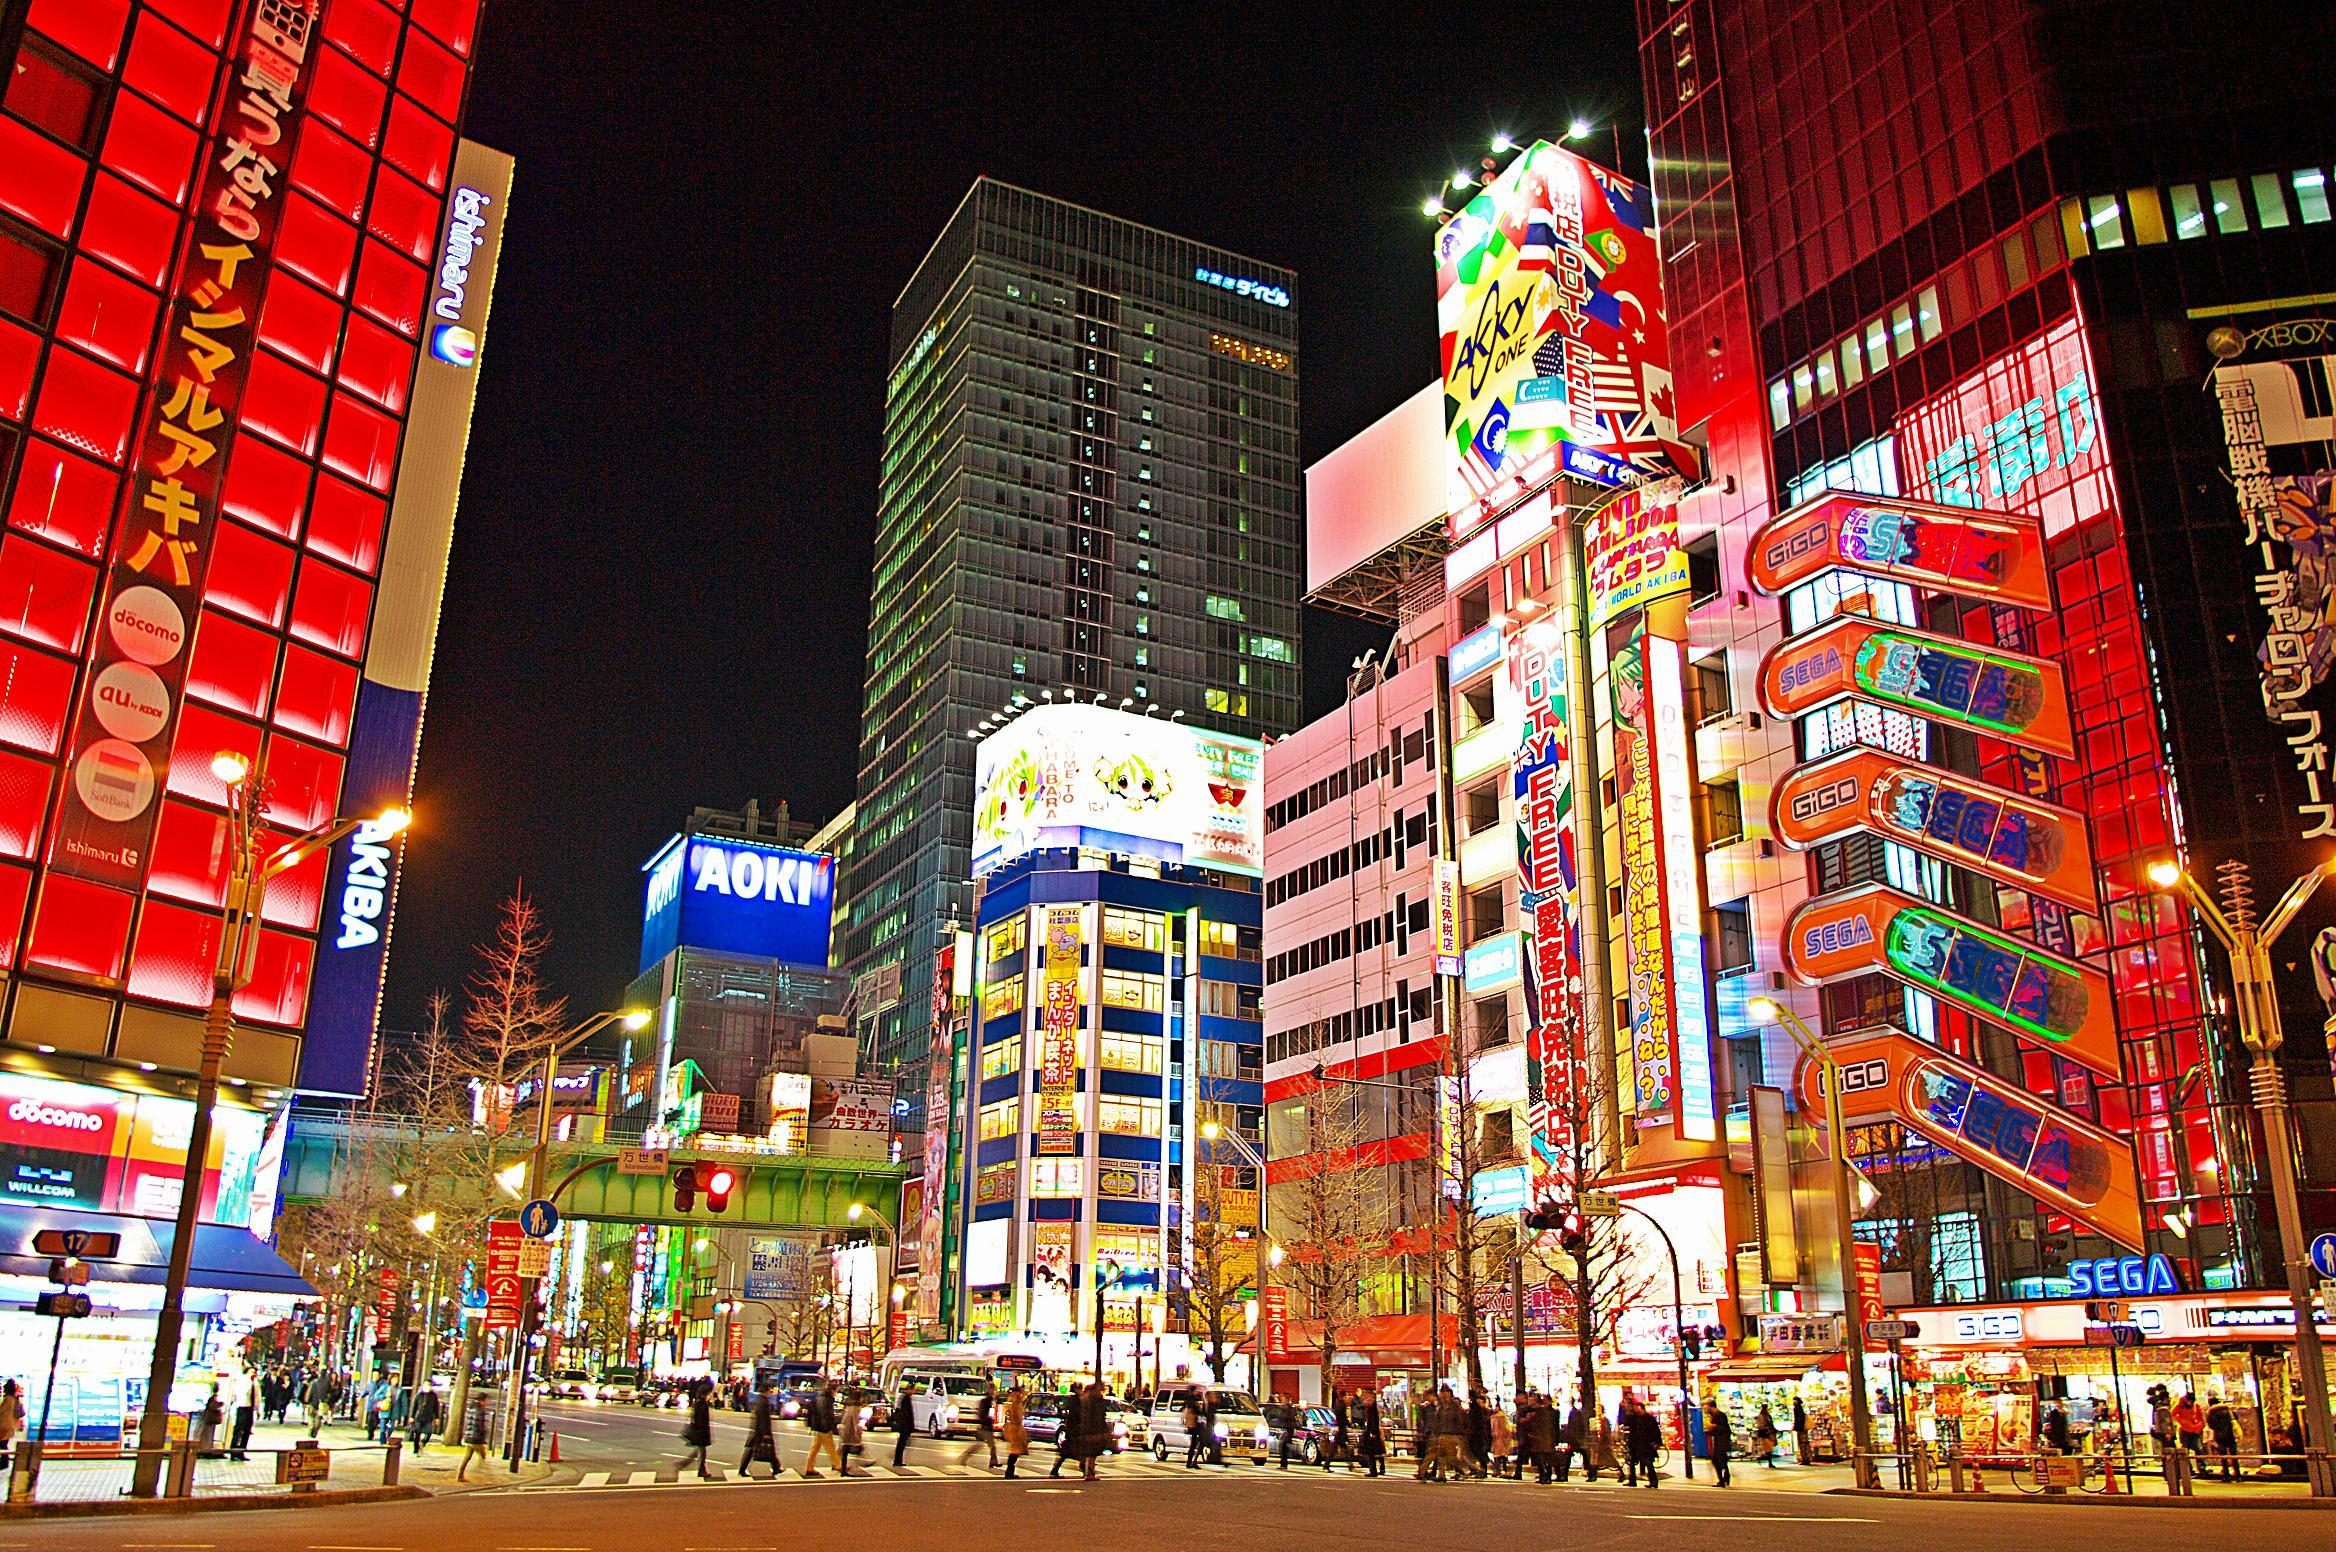 Akihabara (crédit photo : http://japanbrandonline.com/blog/akihabara/)